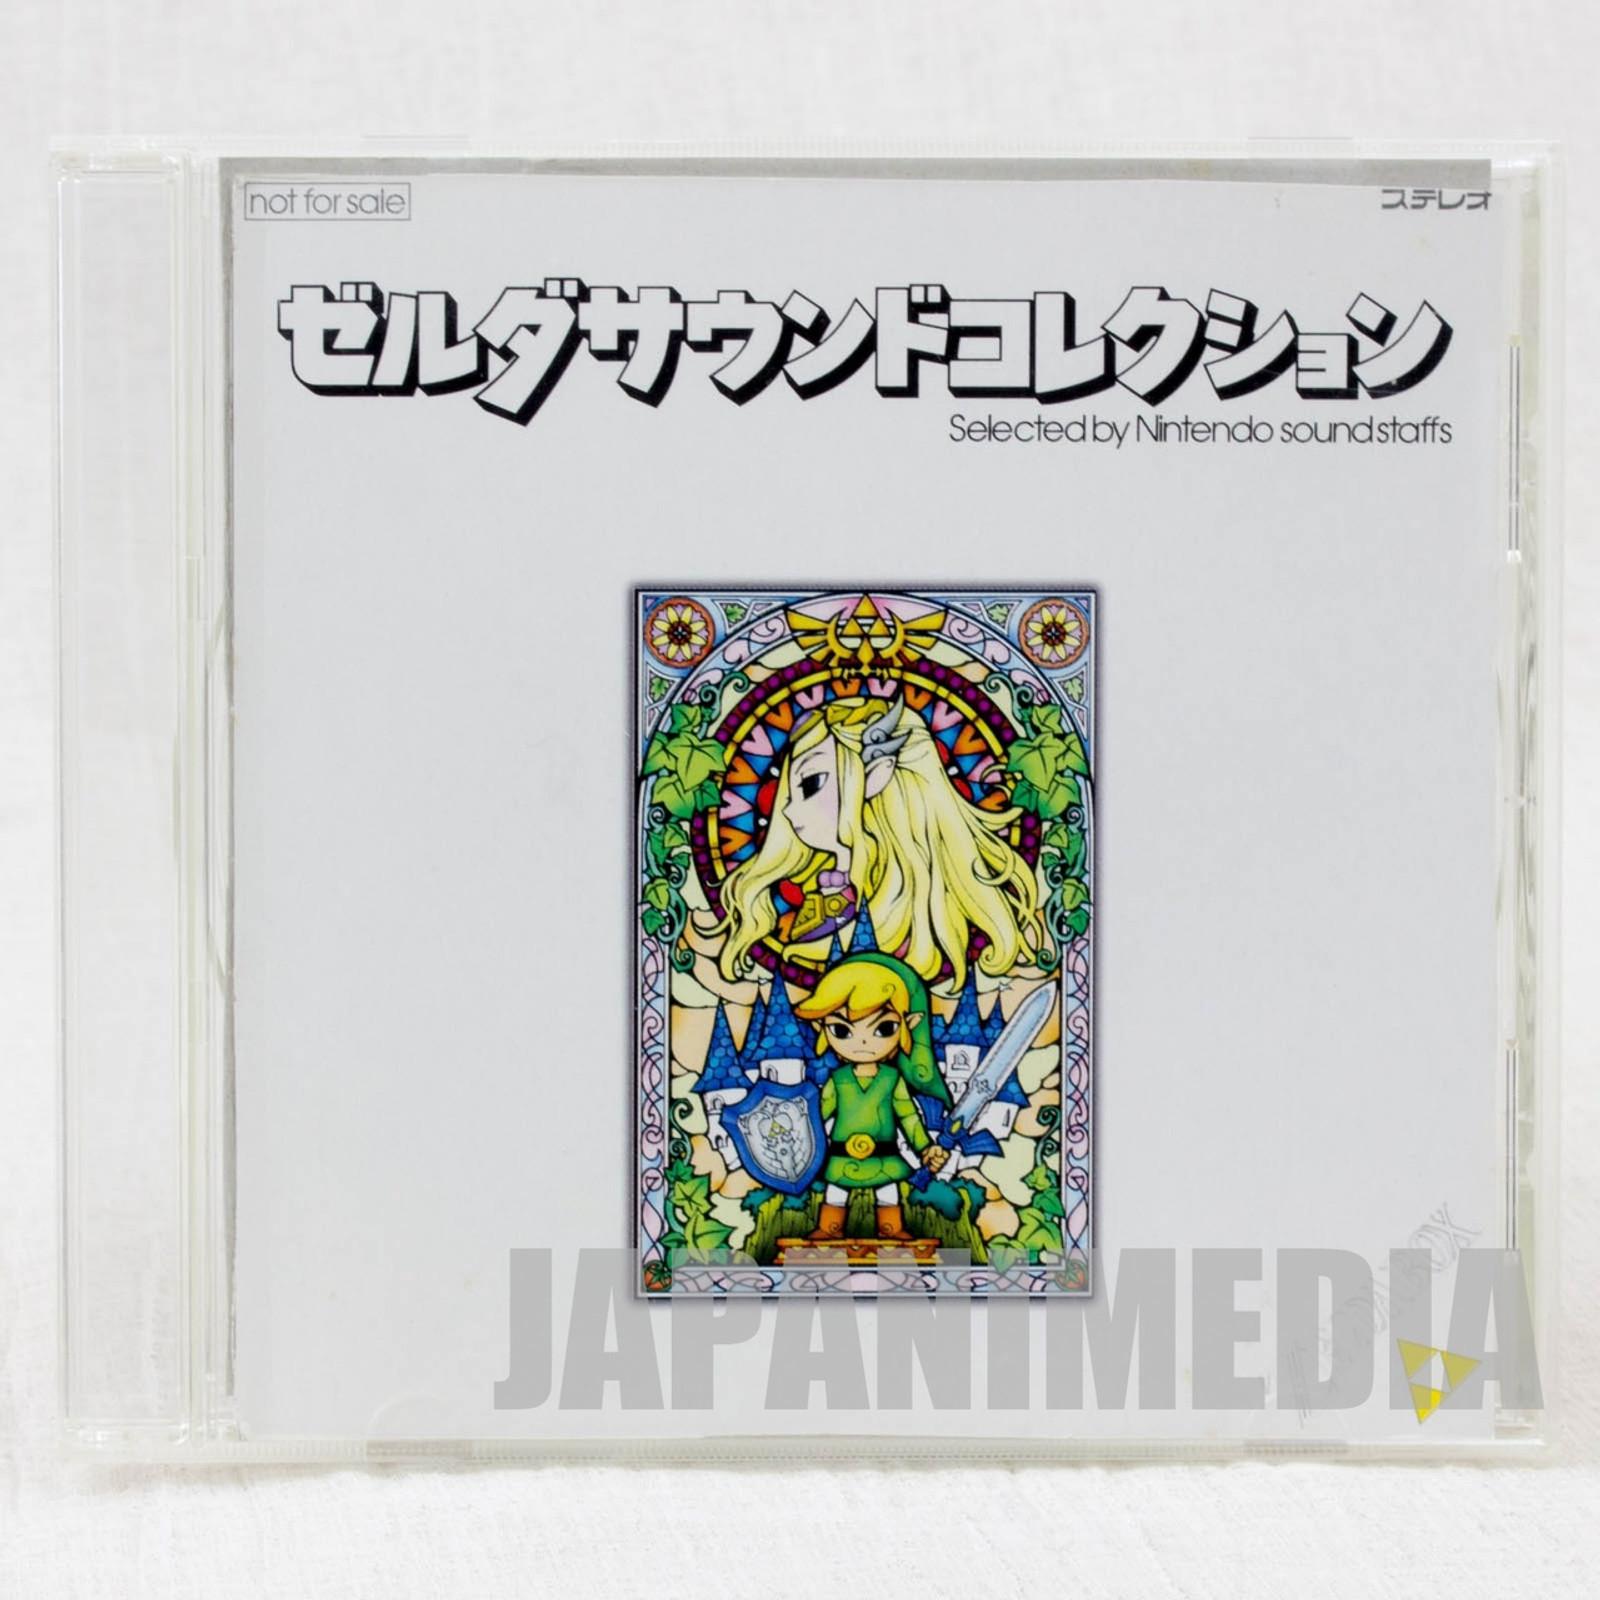 The Legend of Zelda Zelda BOX Sound Collection CD Nintendo Famitsu Cube JAPAN GAME